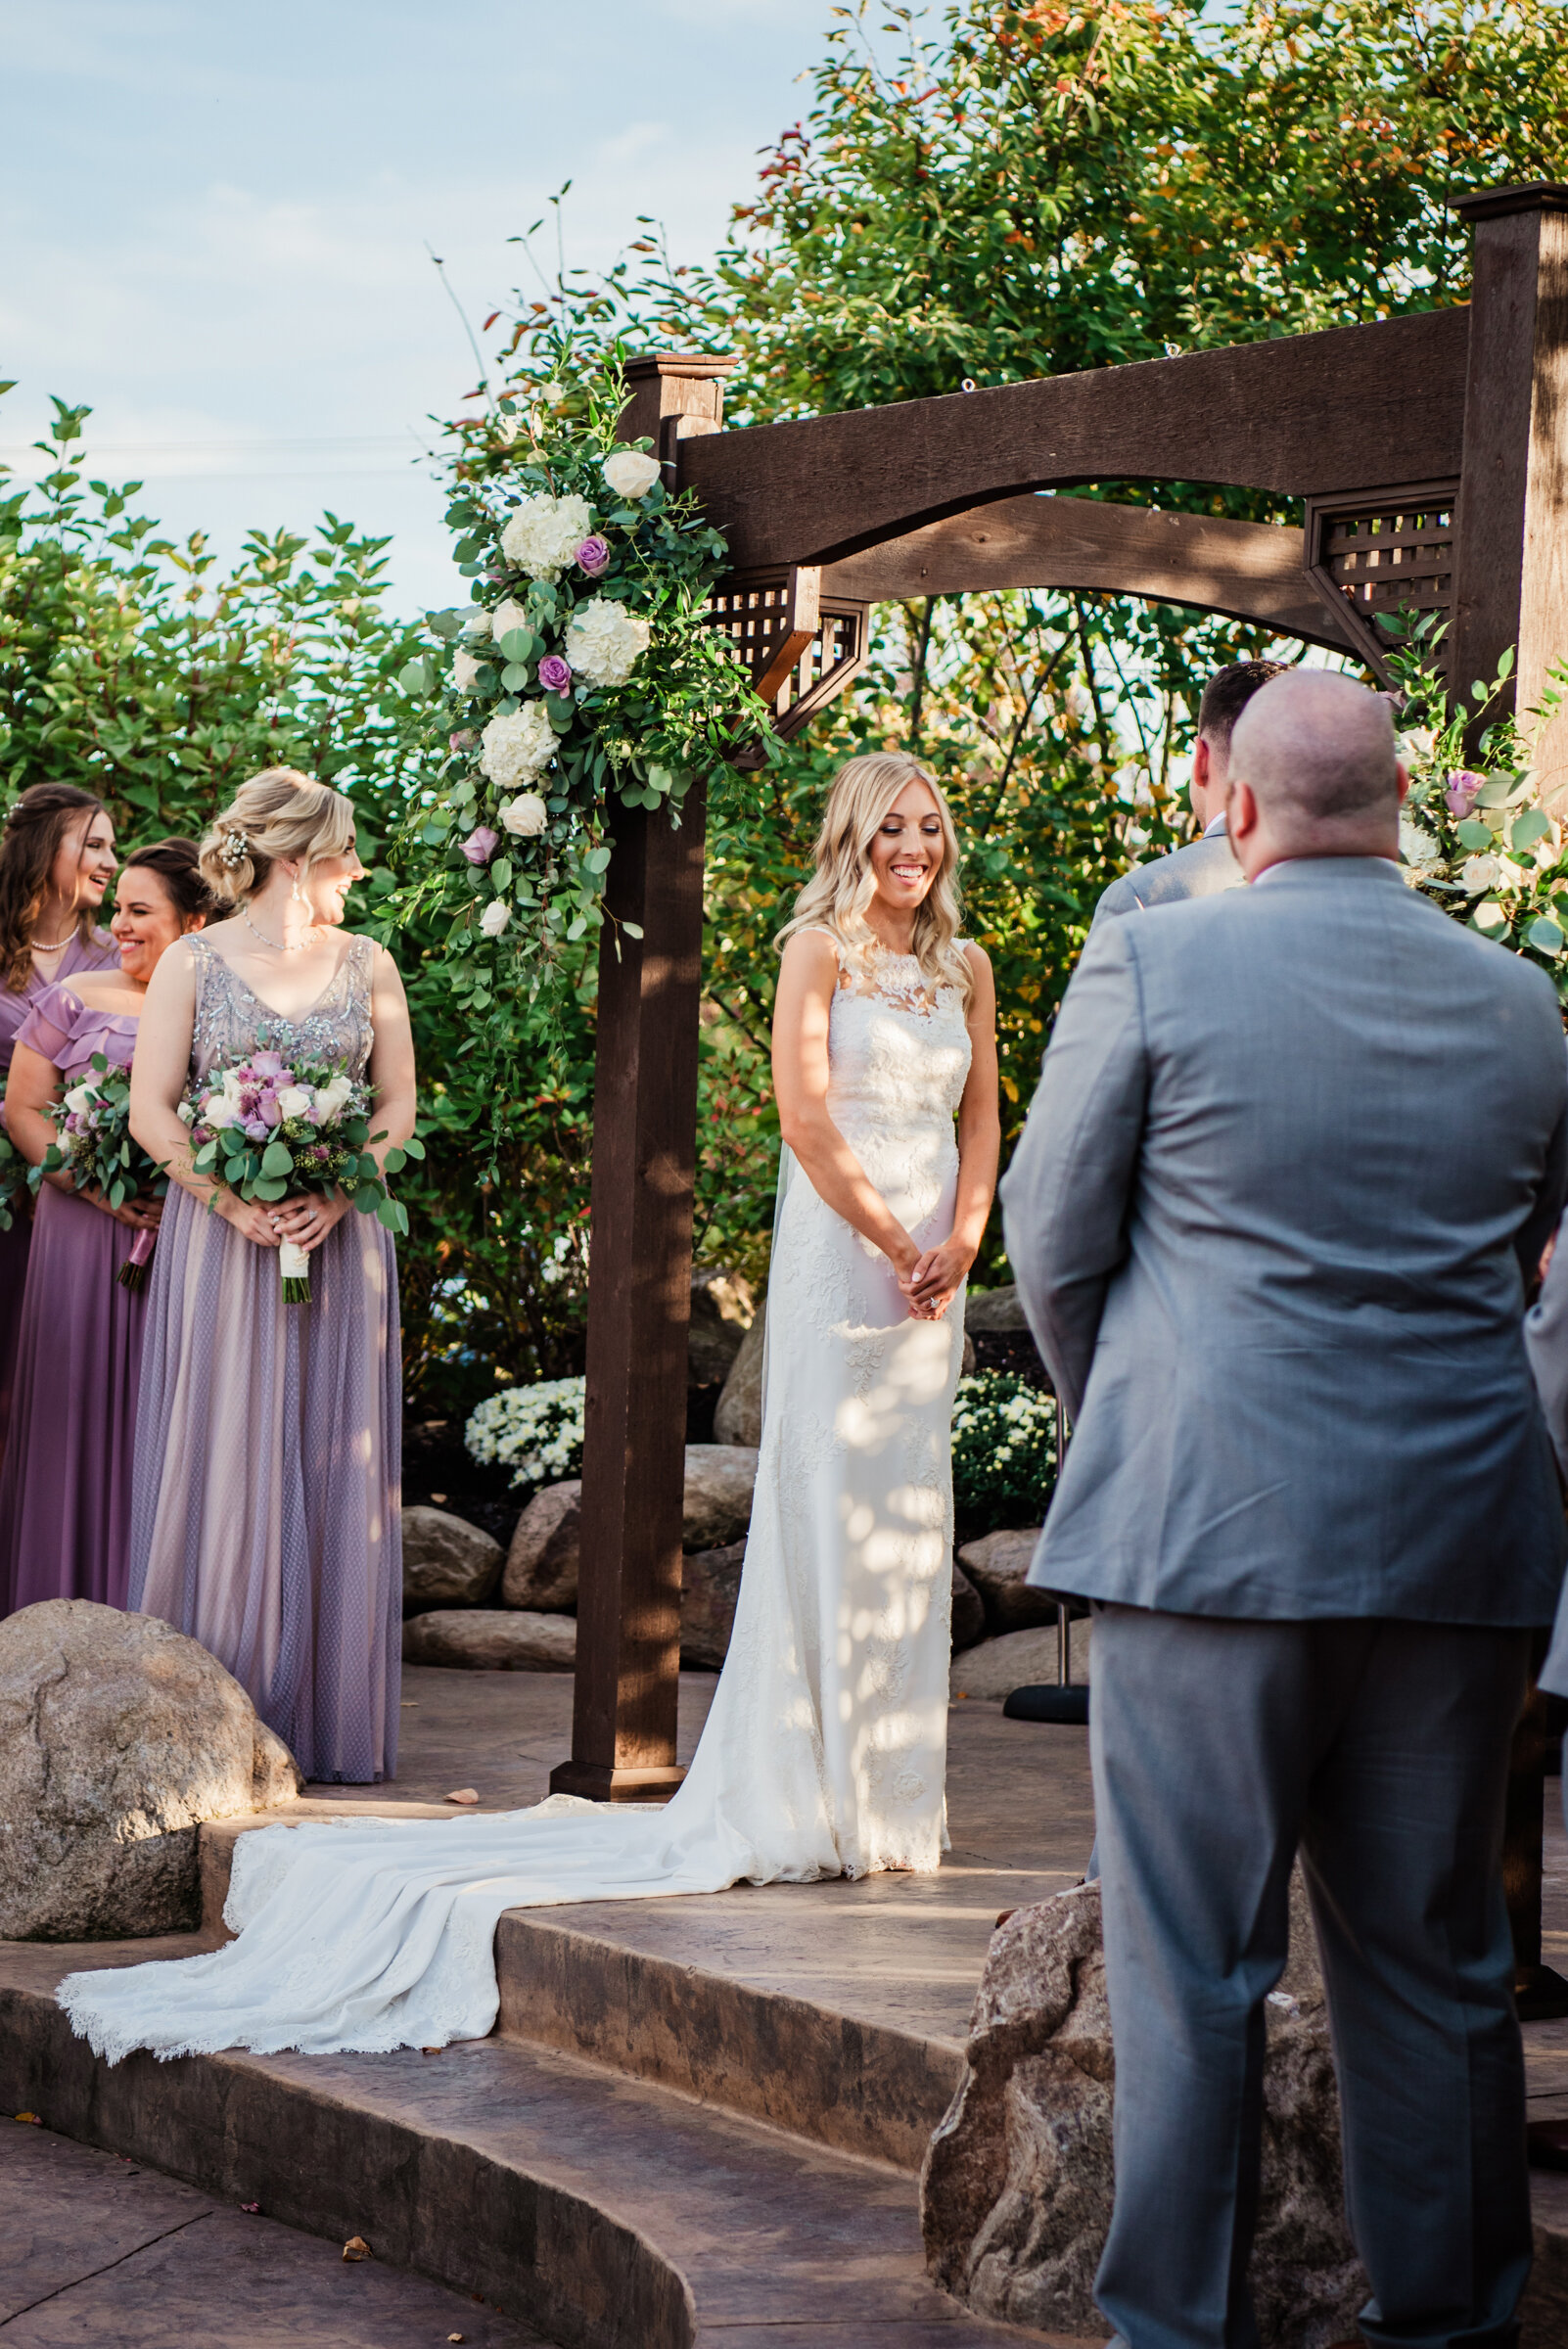 Deerfield_Country_Club_Rochester_Wedding_JILL_STUDIO_Rochester_NY_Photographer_DSC_6774.jpg